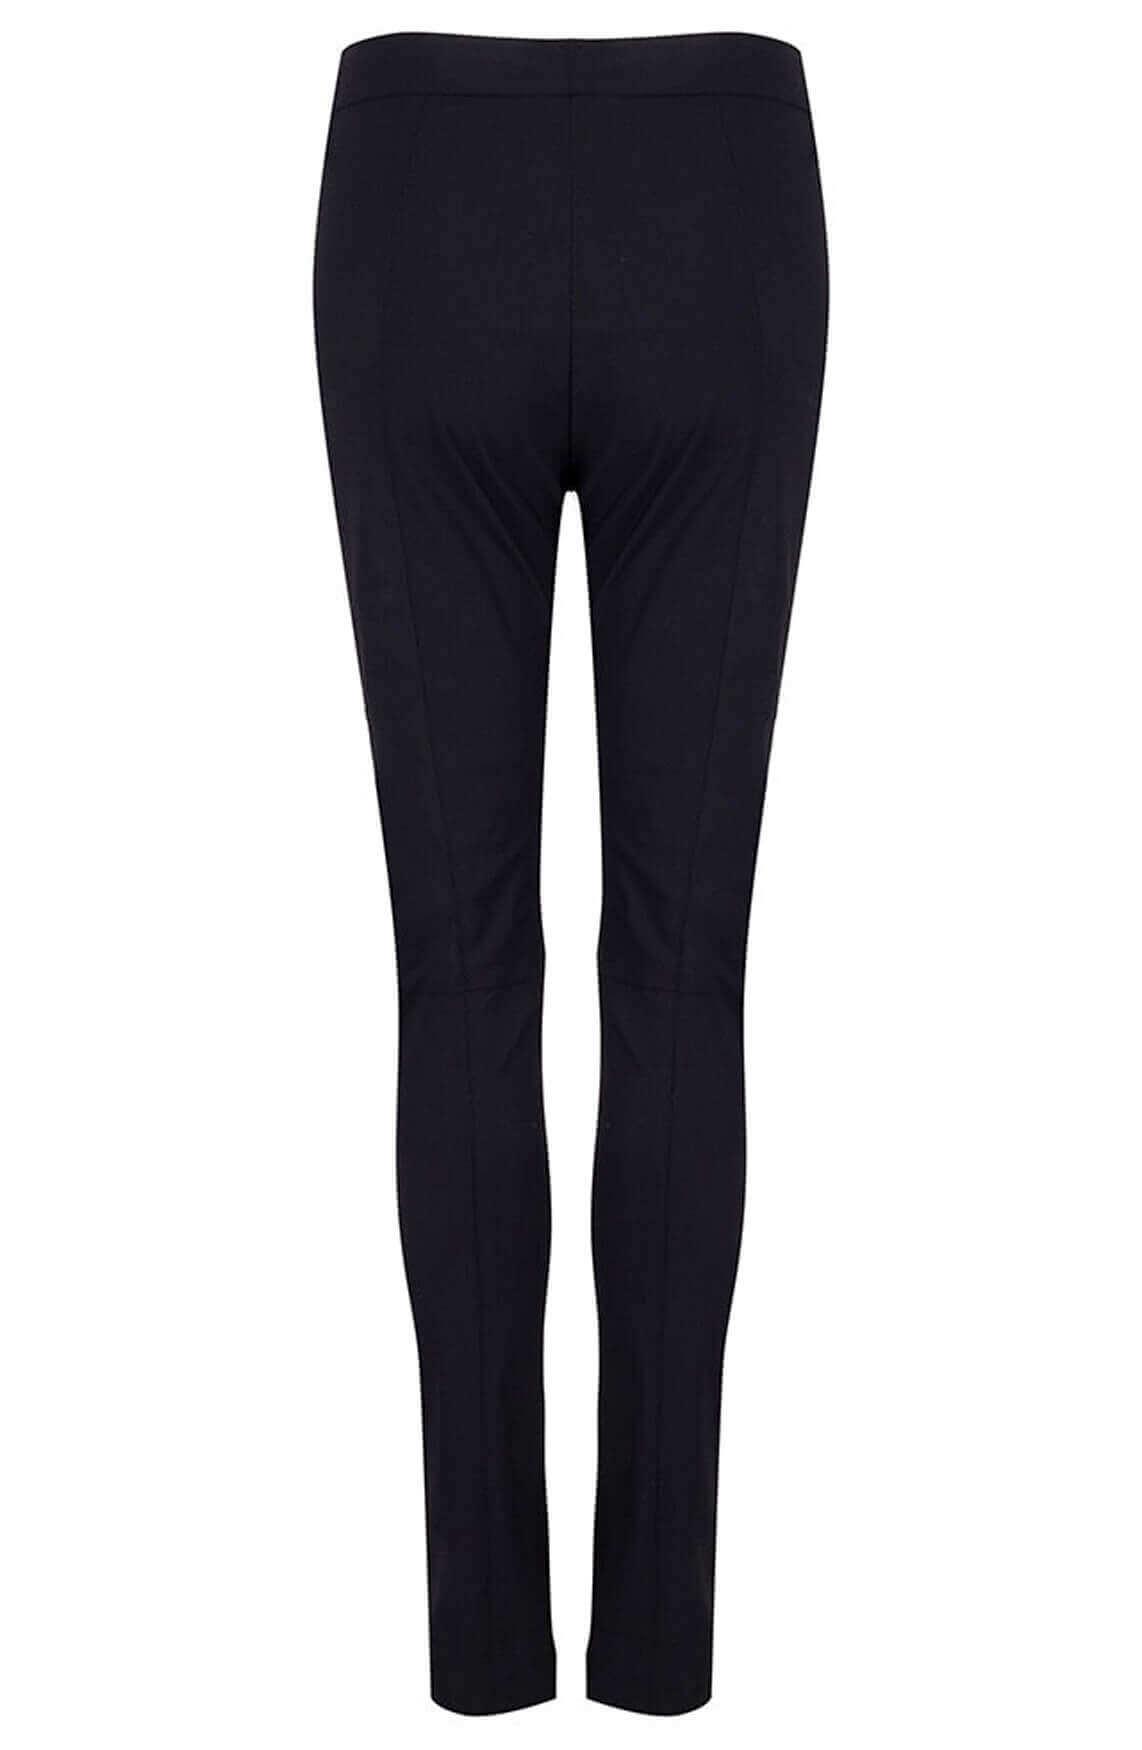 Jane Lushka Dames Pattie broek met split zwart